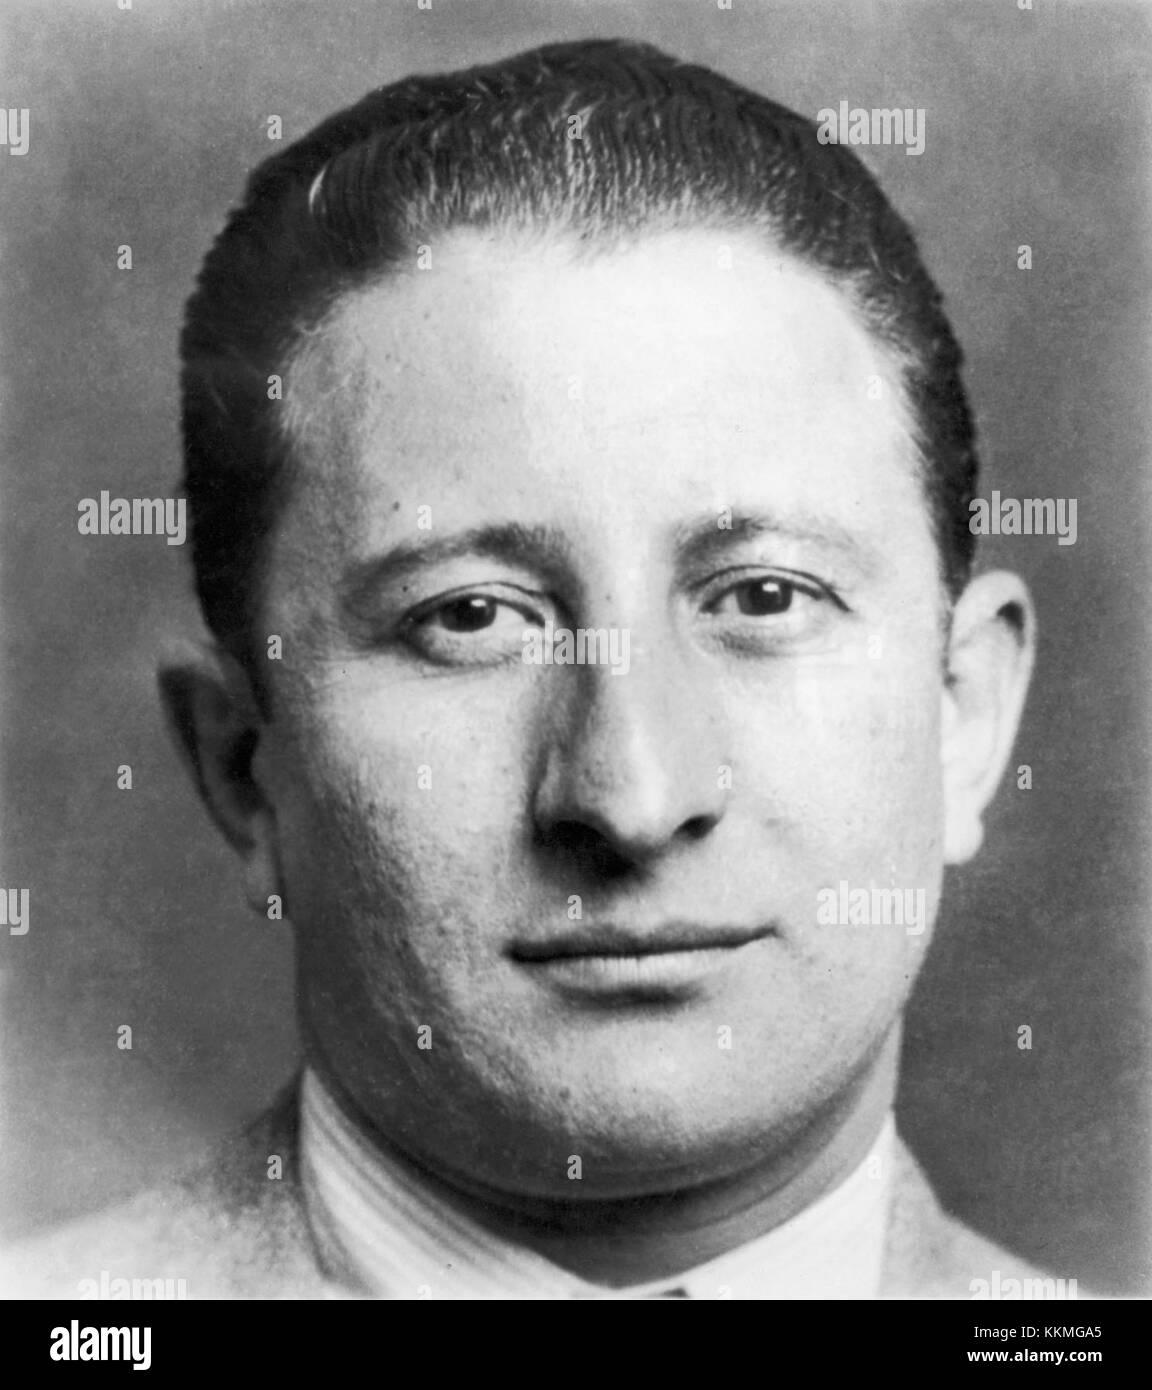 circa 1935:  Headshot of Italian gangster Carlo Gambino.  (Photo by Hulton Archive/Getty Images) Carlo Gambino - Stock Image